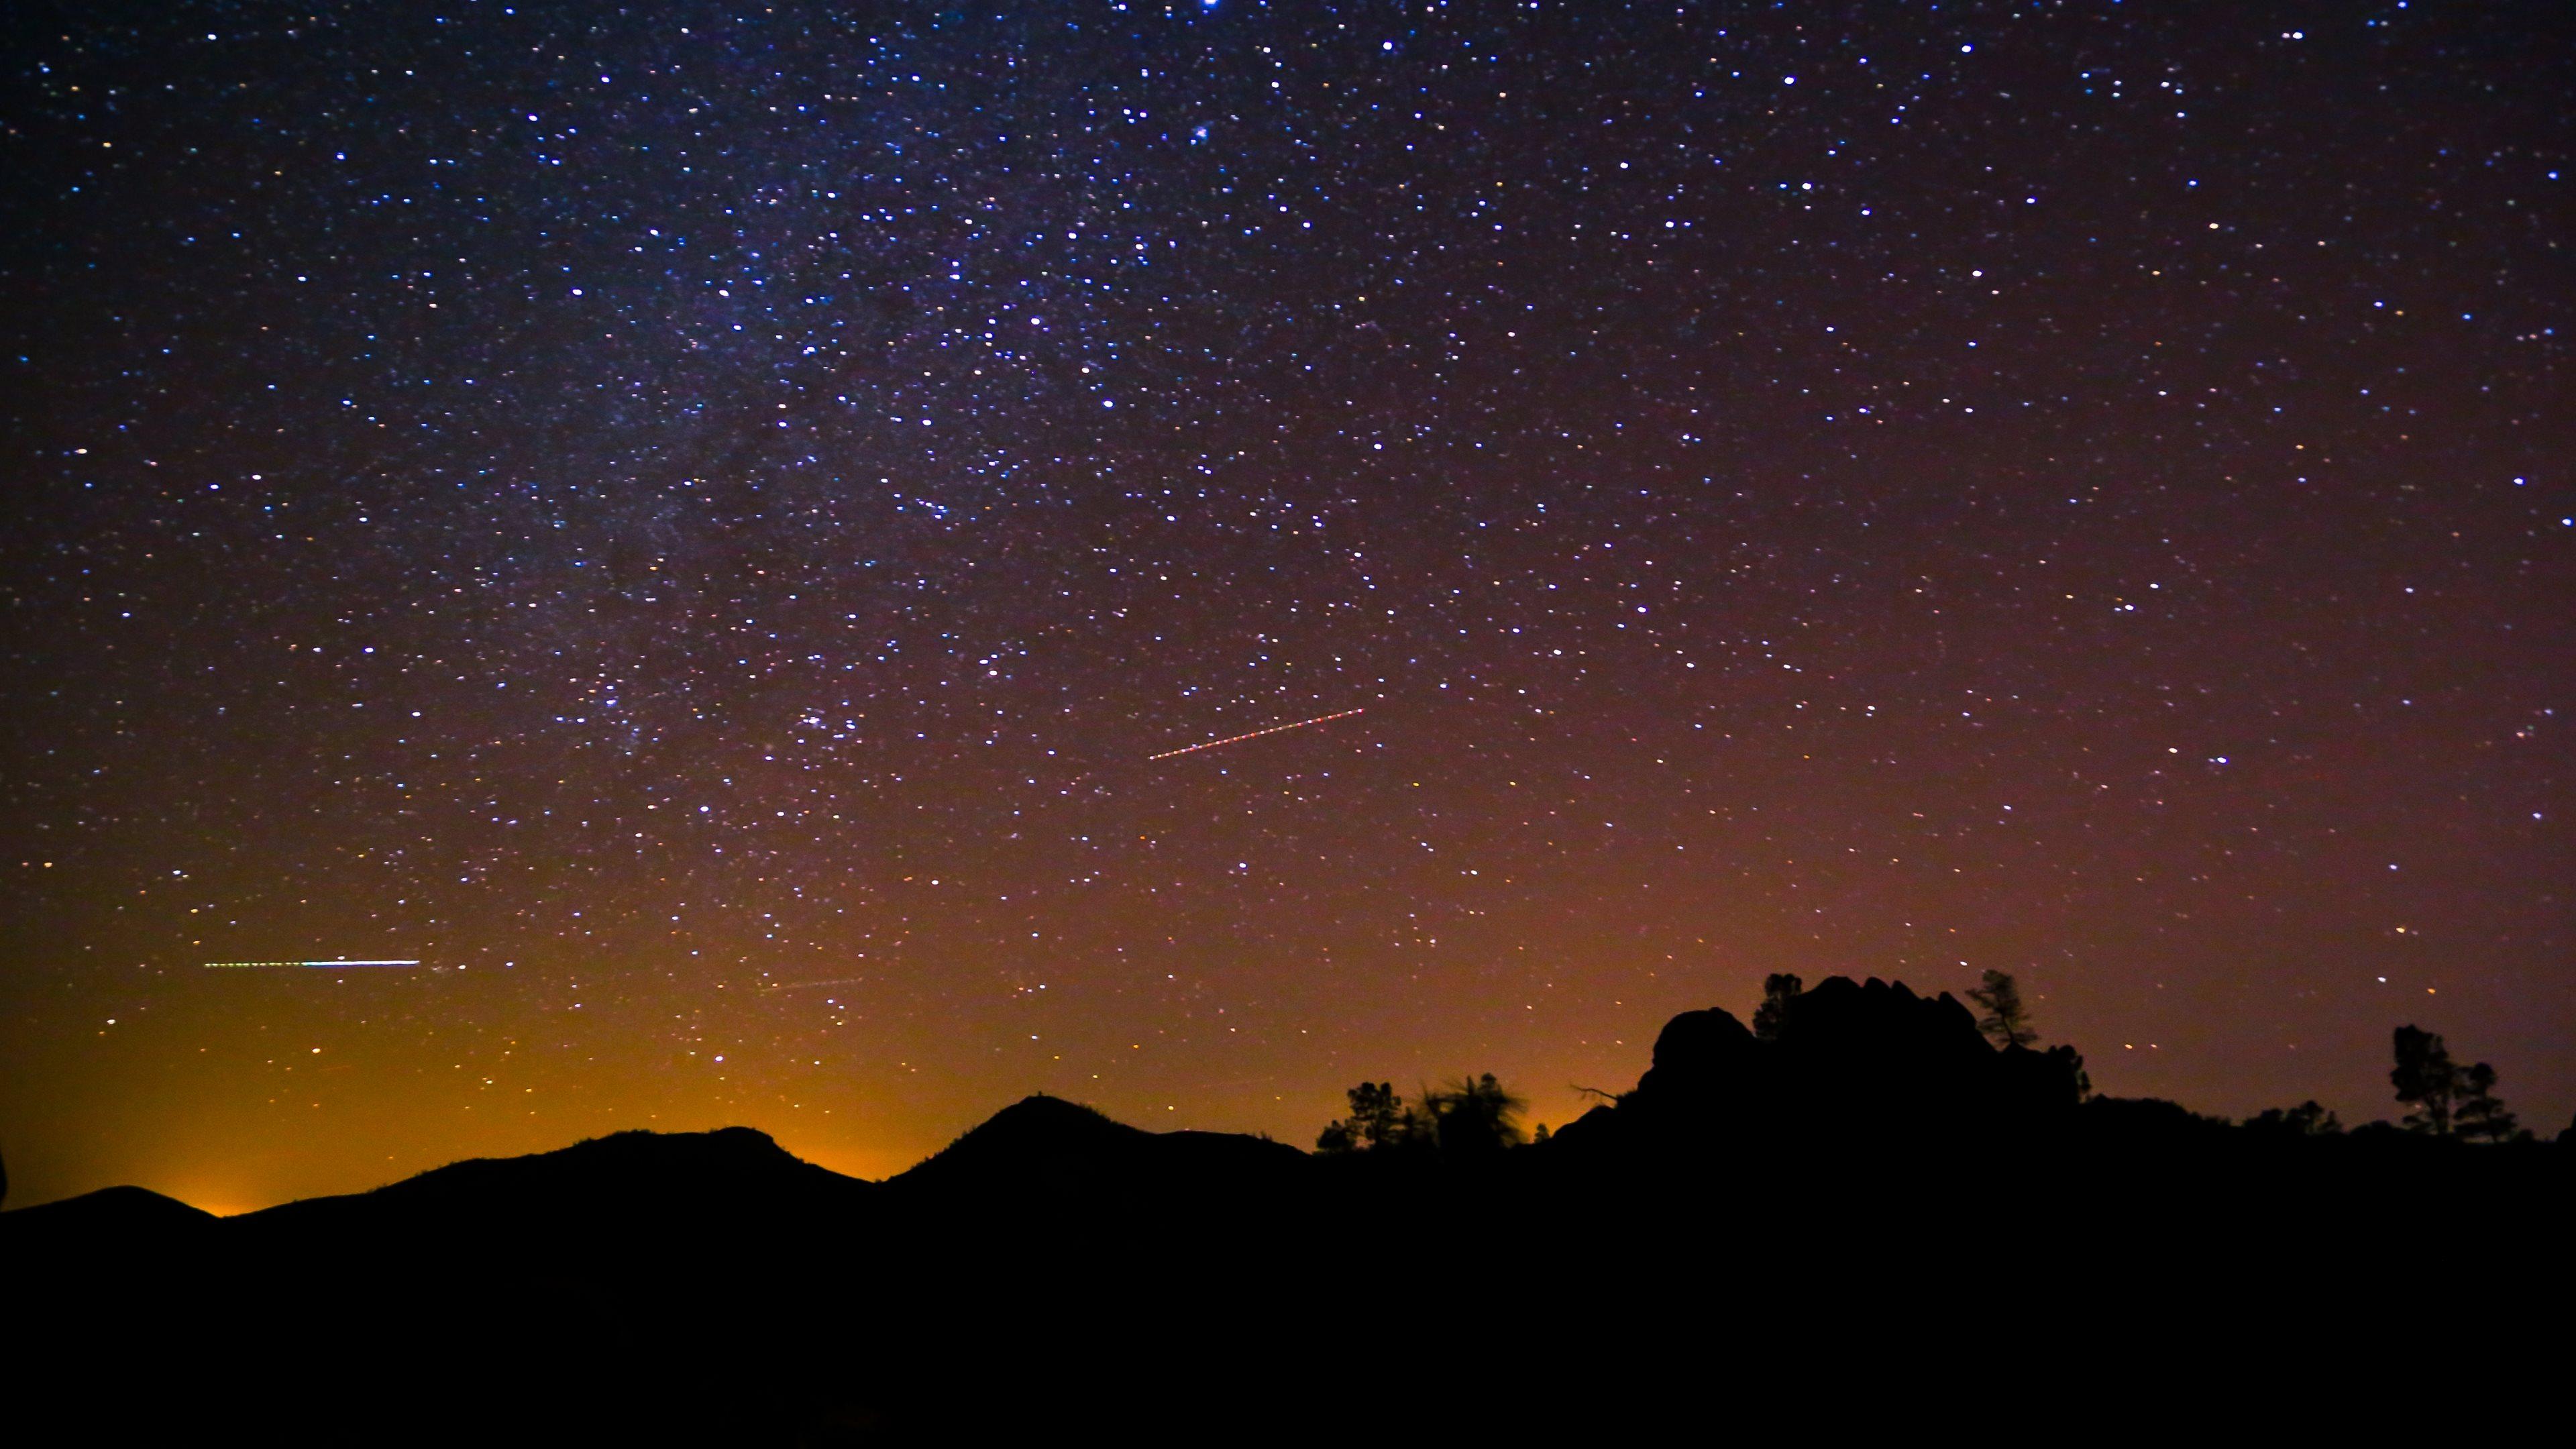 Milky Way Constellation on the Night Sky 3840x2160